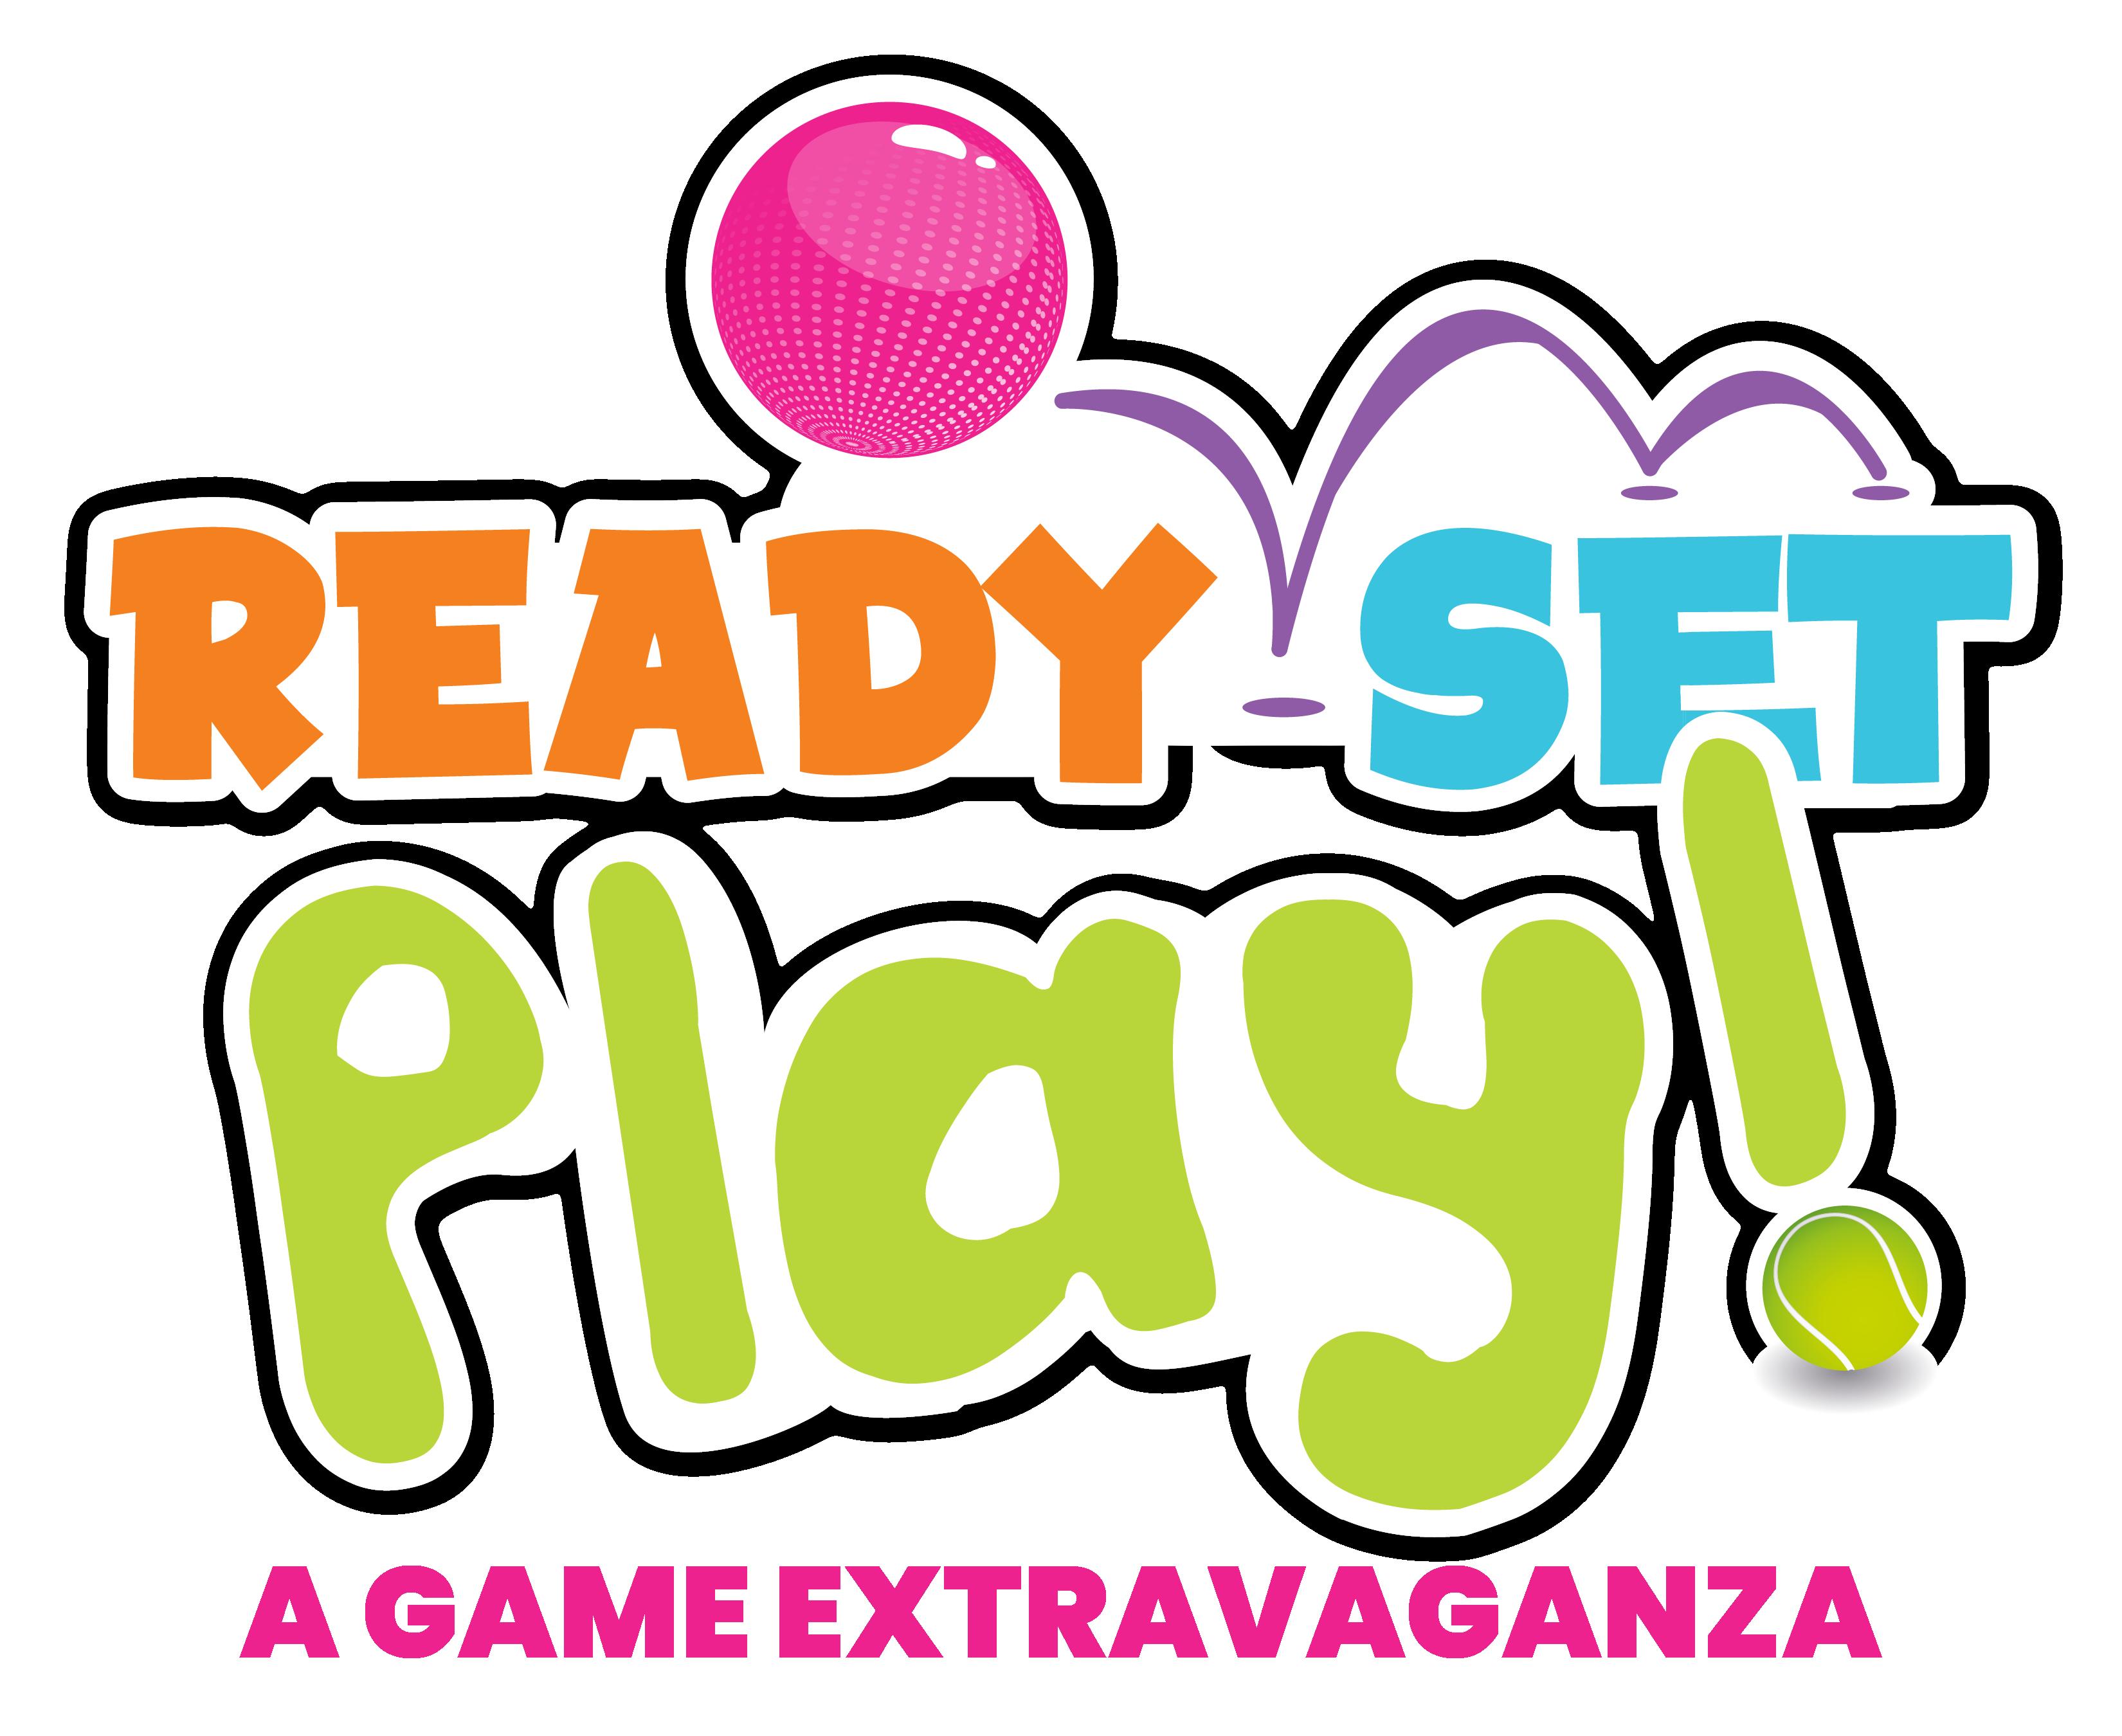 CampTastic Theme Logos 2021_Ready Set Play with Tagline